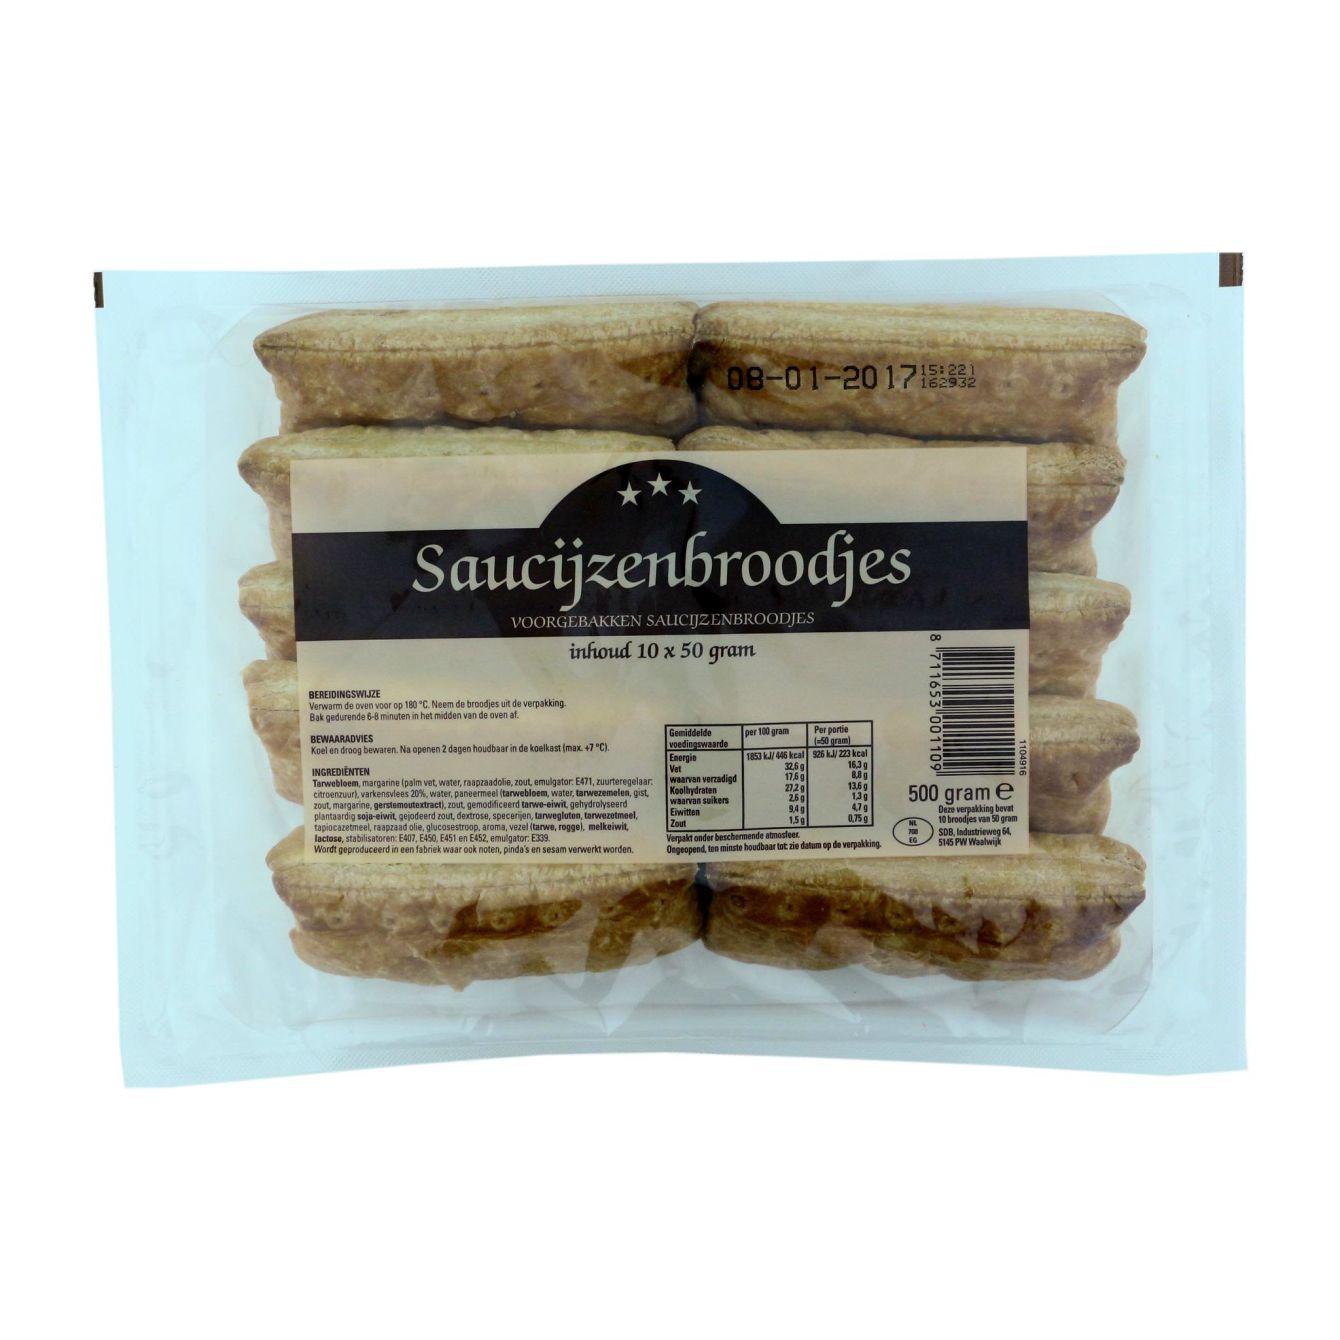 Saucijzenbroodjes